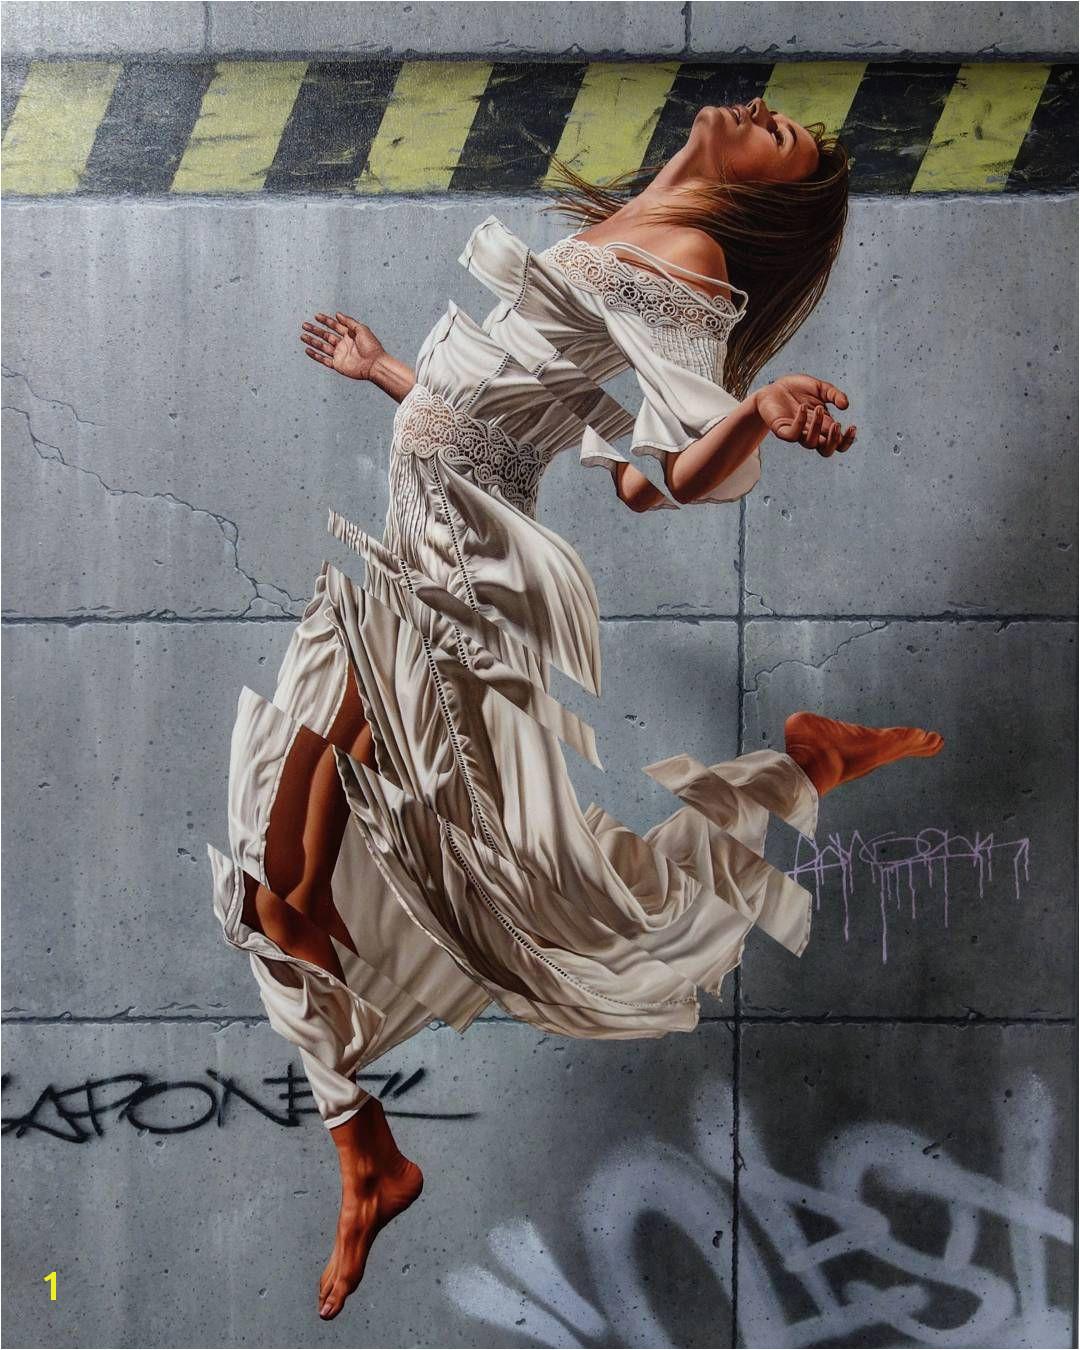 Pin von Adelina Georgieva auf Graffiti murals and street art